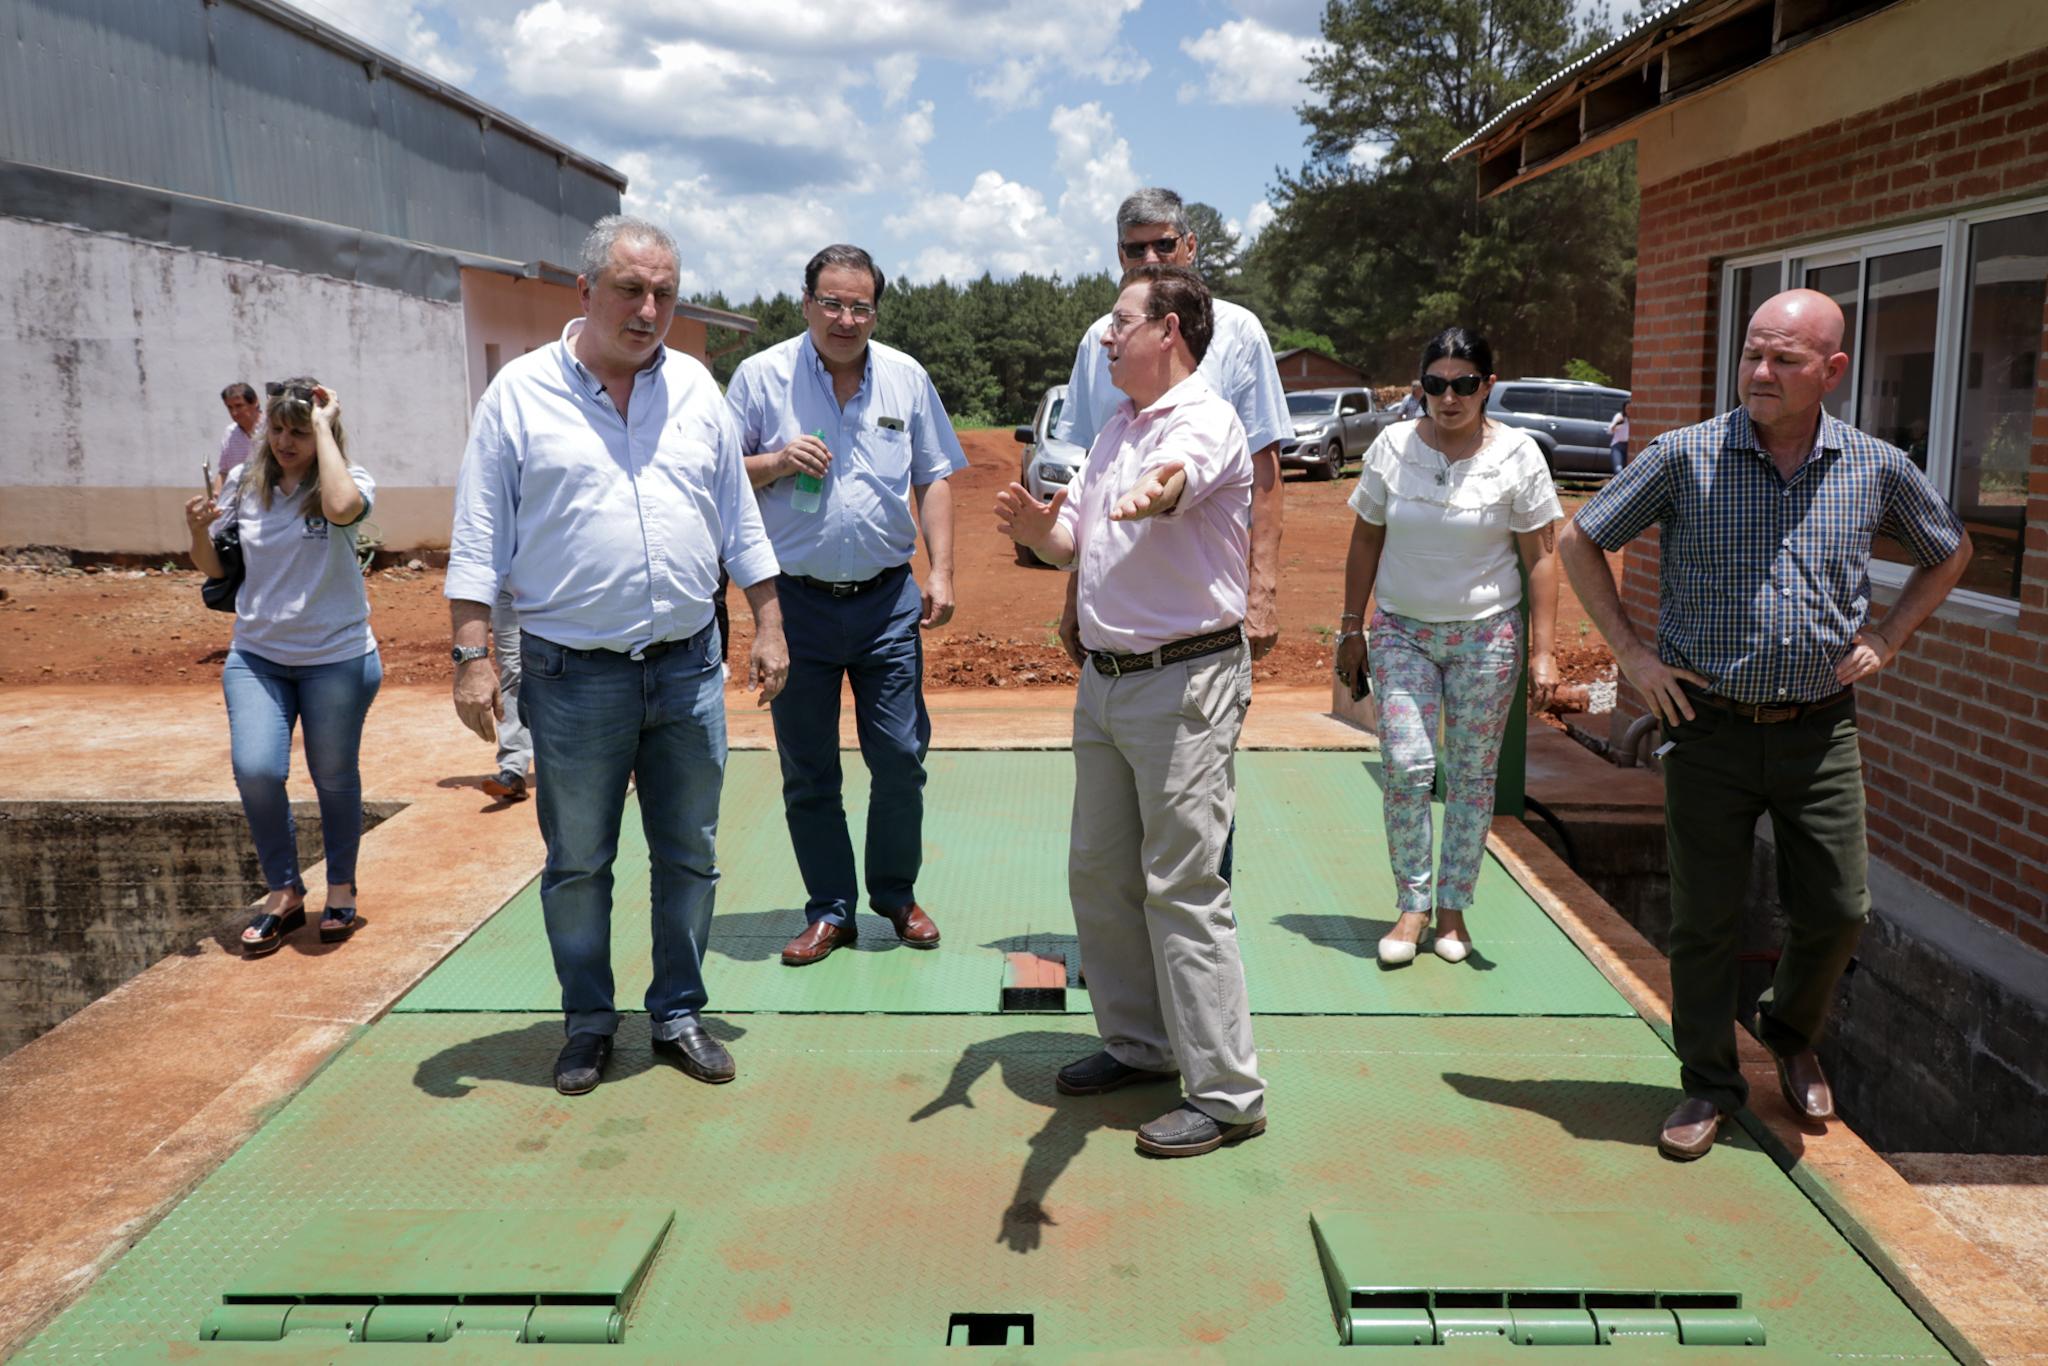 Passalacqua visitó la fábrica de almidón de mandioca en Esperanza